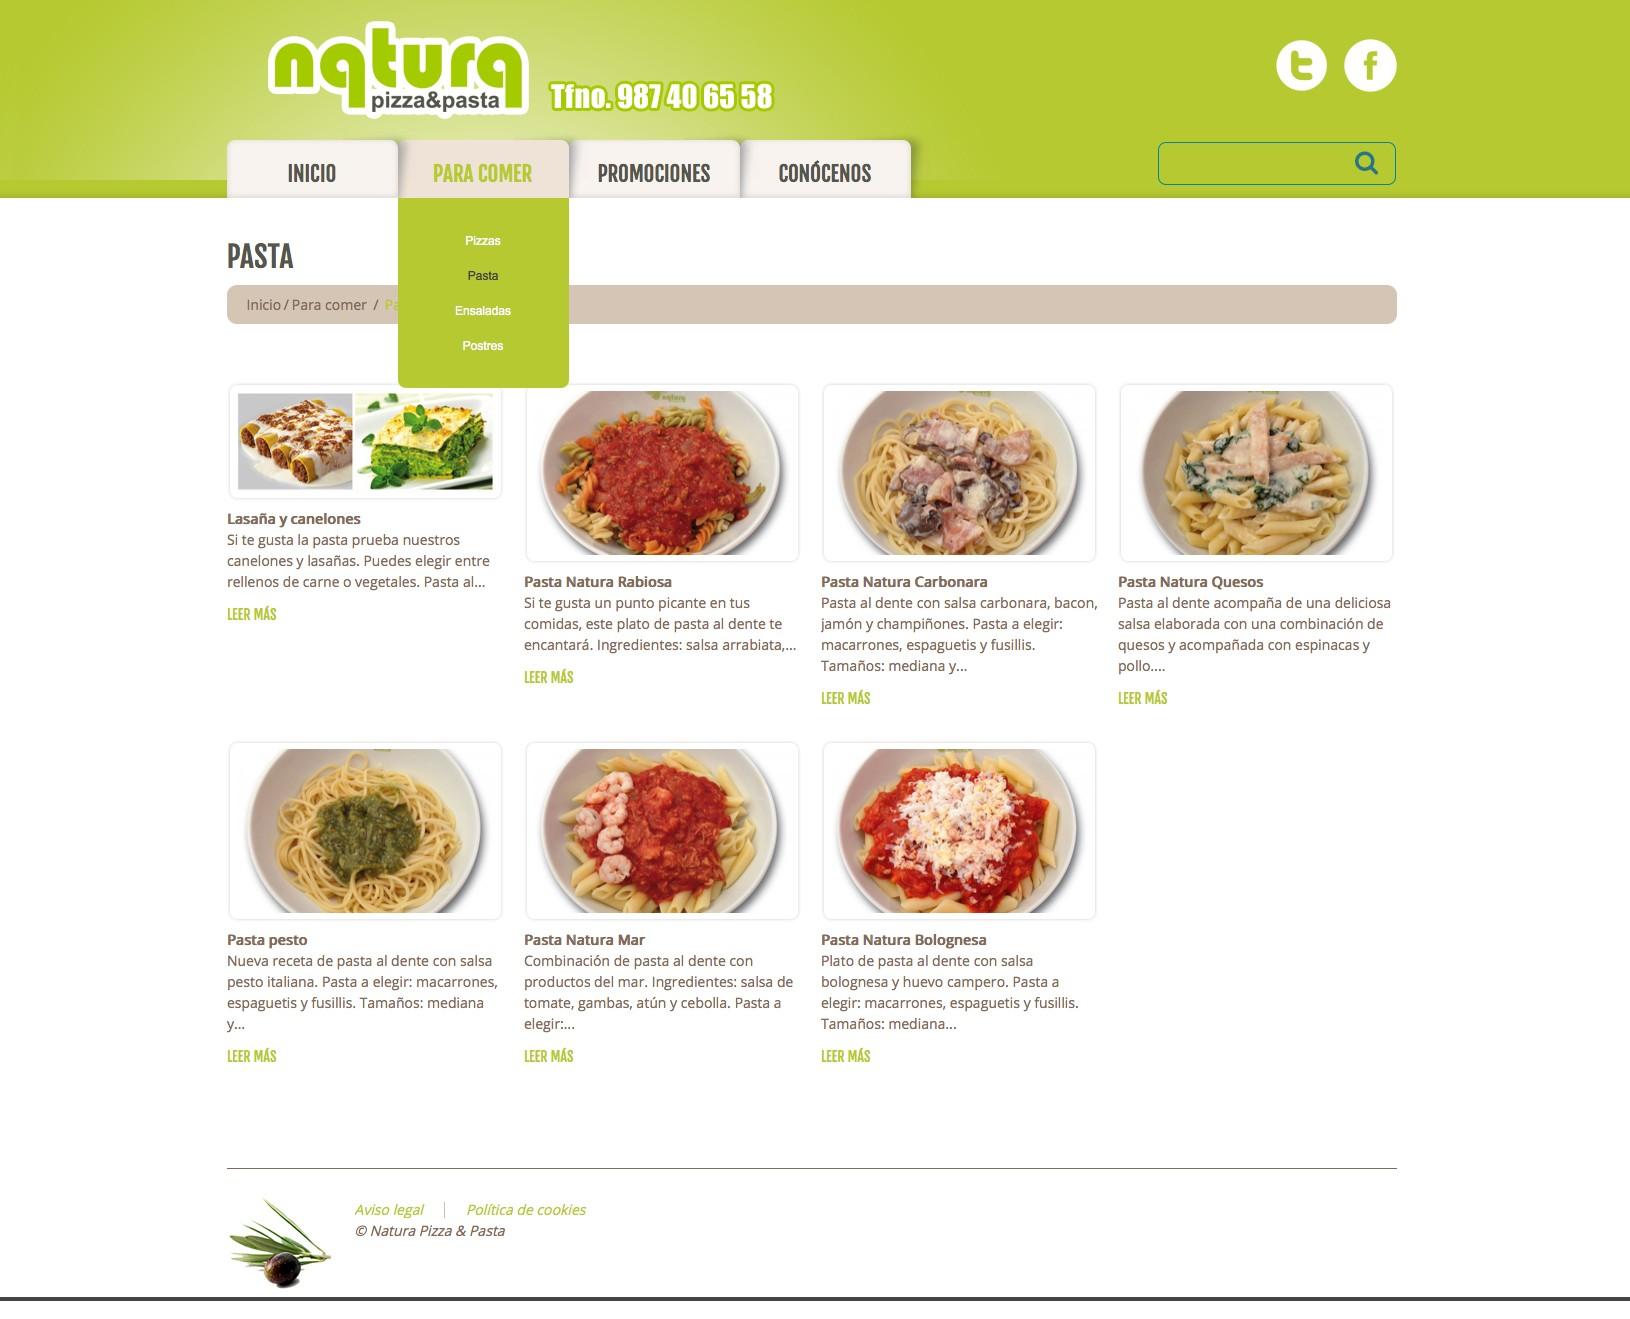 Natura pizzaweb